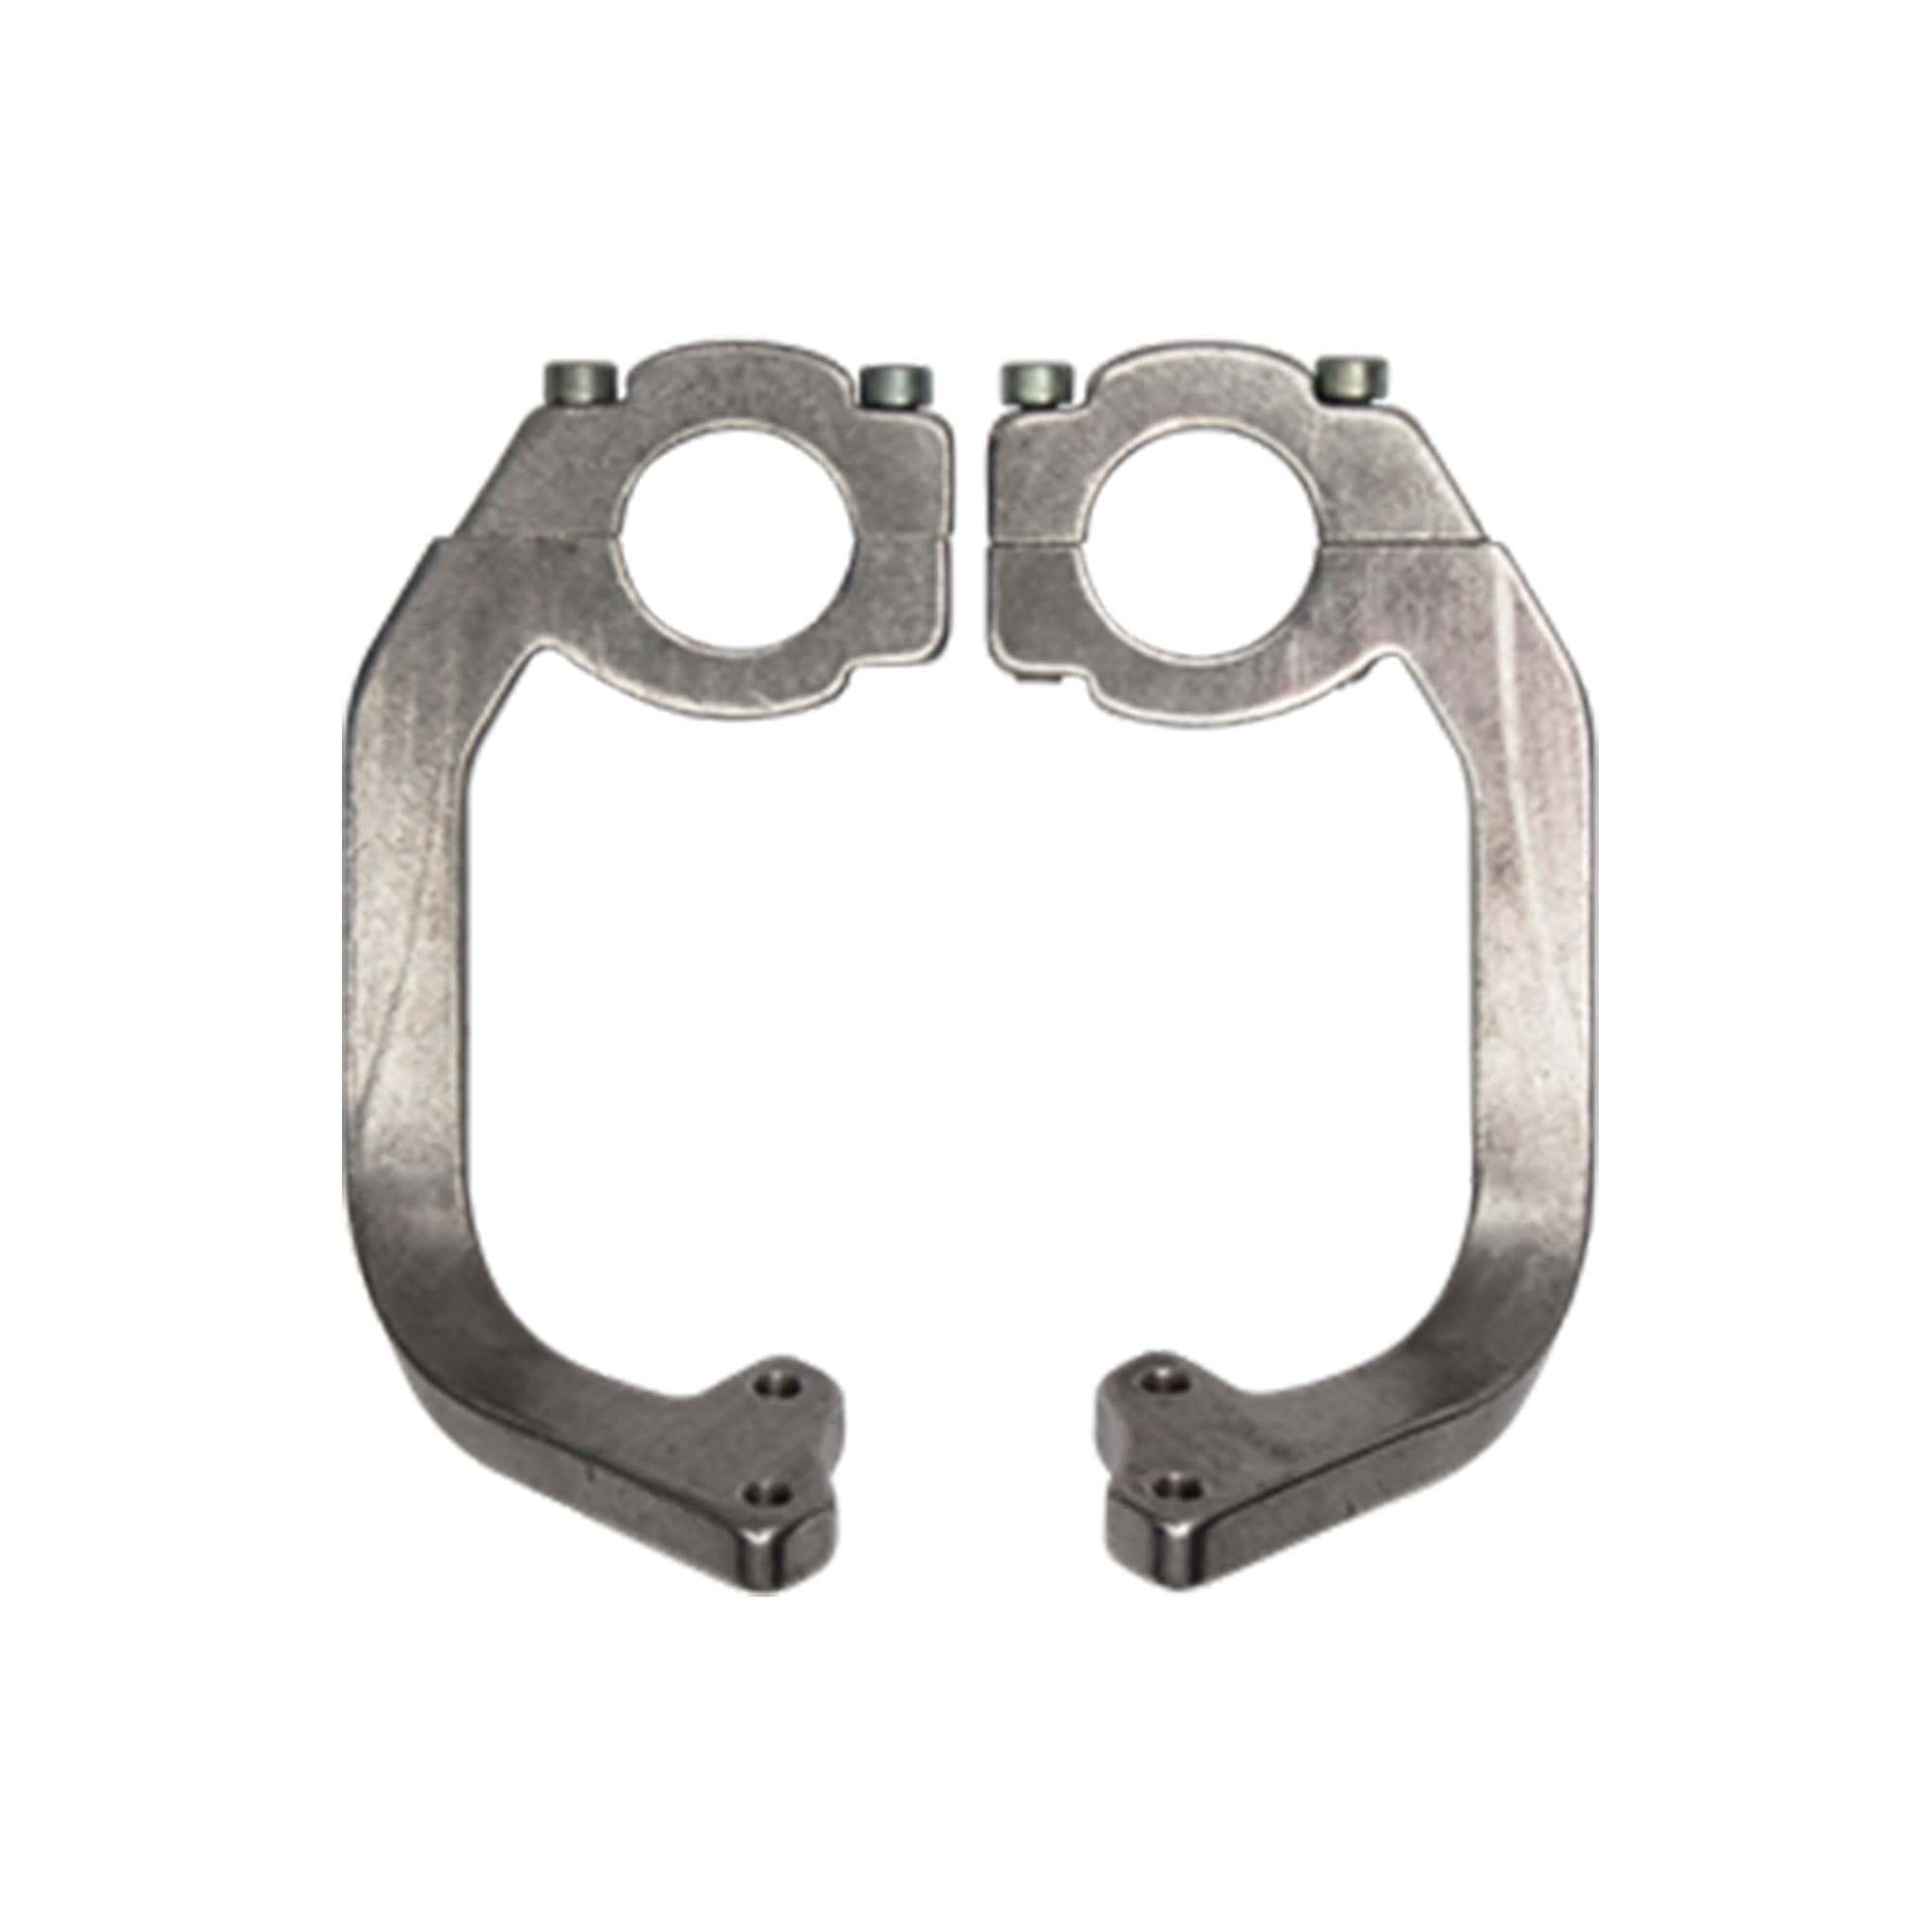 Protetor de Mão Circuit Vector com Haste de Alumínio (Fibra de Carbono)  - HP Race Off Road